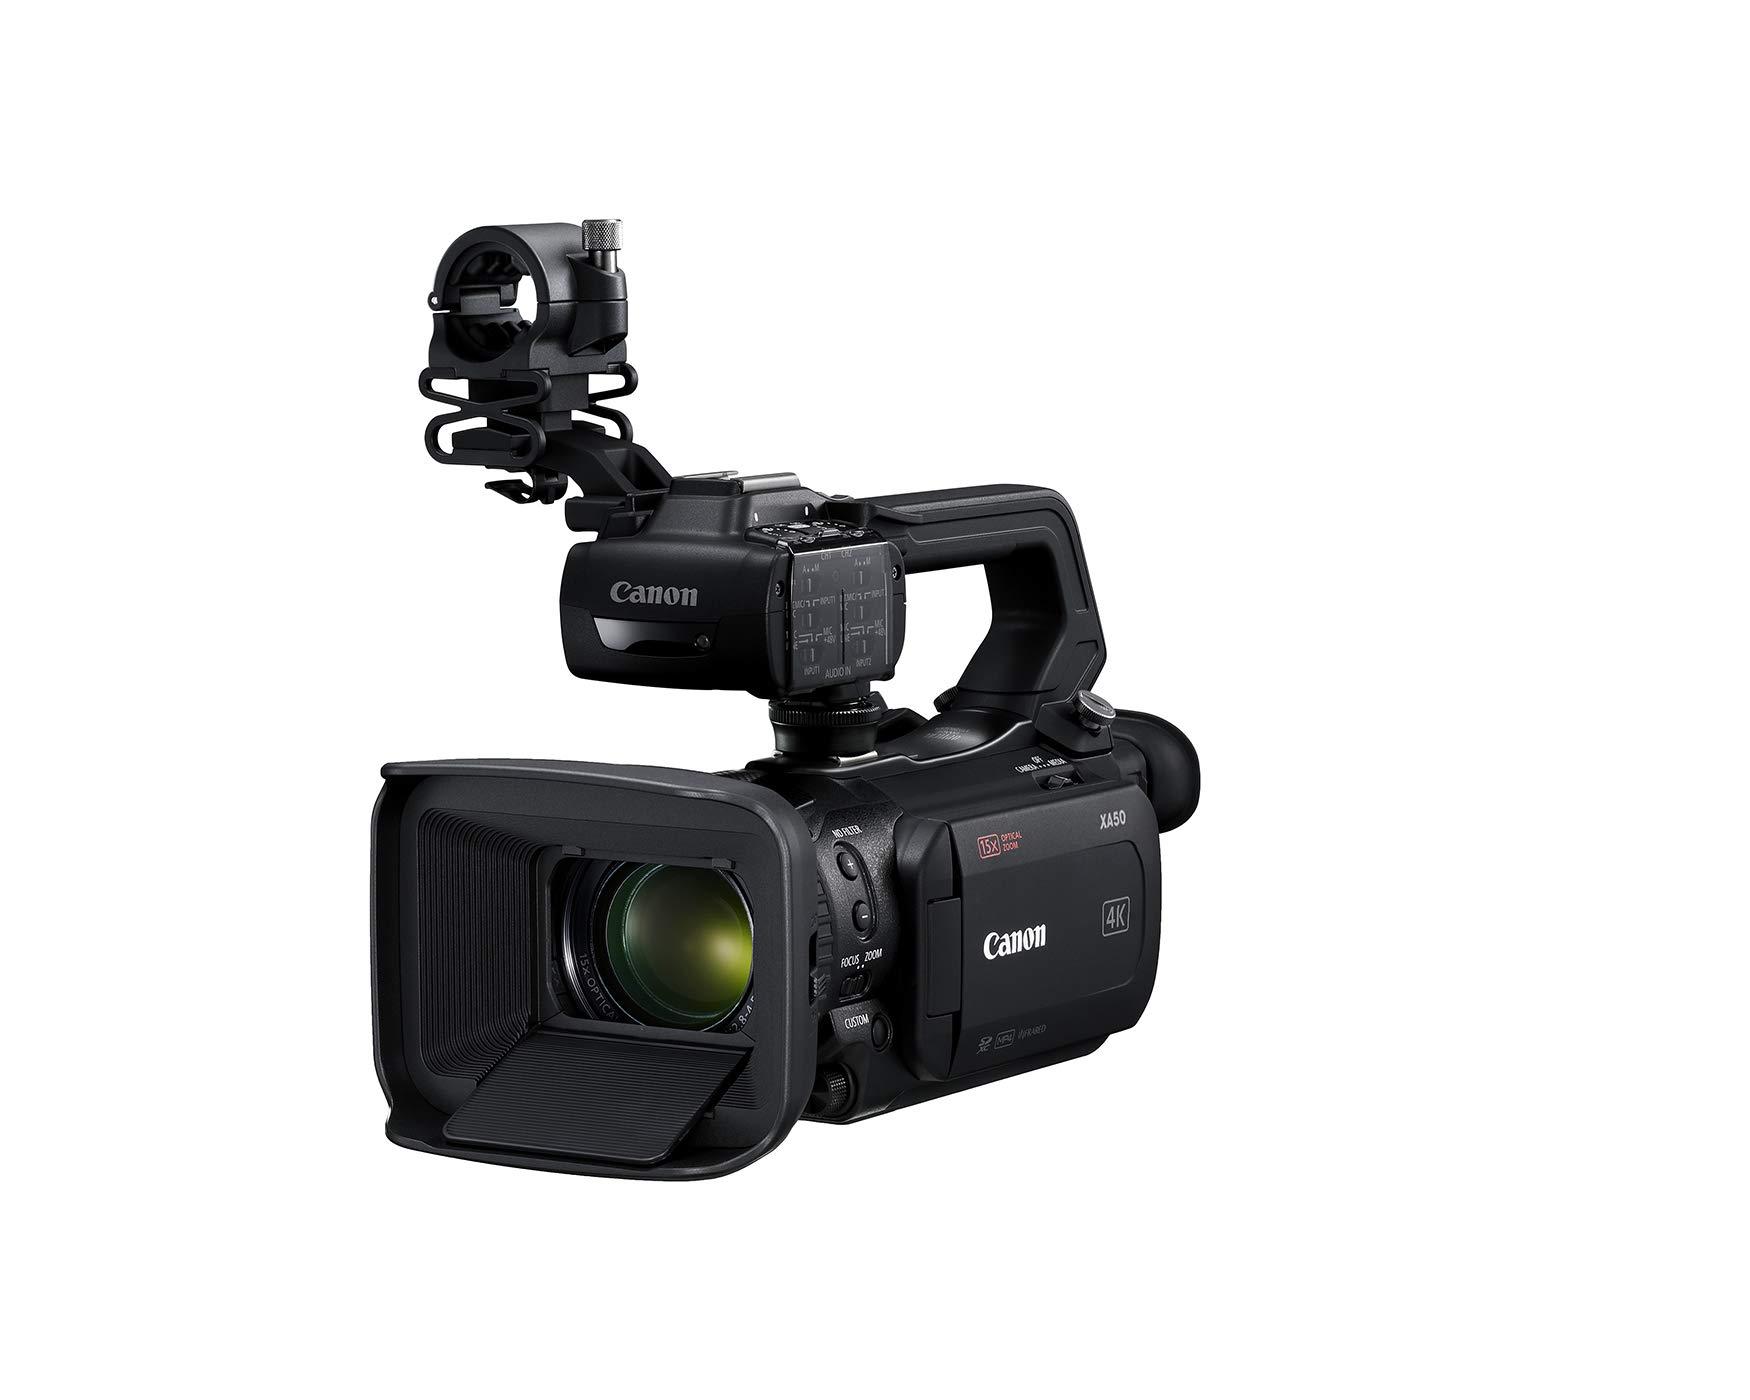 HC-X2000 AG-CX350 AG-UX180 BM Premium VW-VBD58 Battery for Panasonic AG-VBR59 HC-X1 BGH1 AG-AC30 AJ-PX270 HC-X1500 AG-CX10 AJ-PX230 Camcorders AG-UX90 HC-MDH3E AG-DVX200